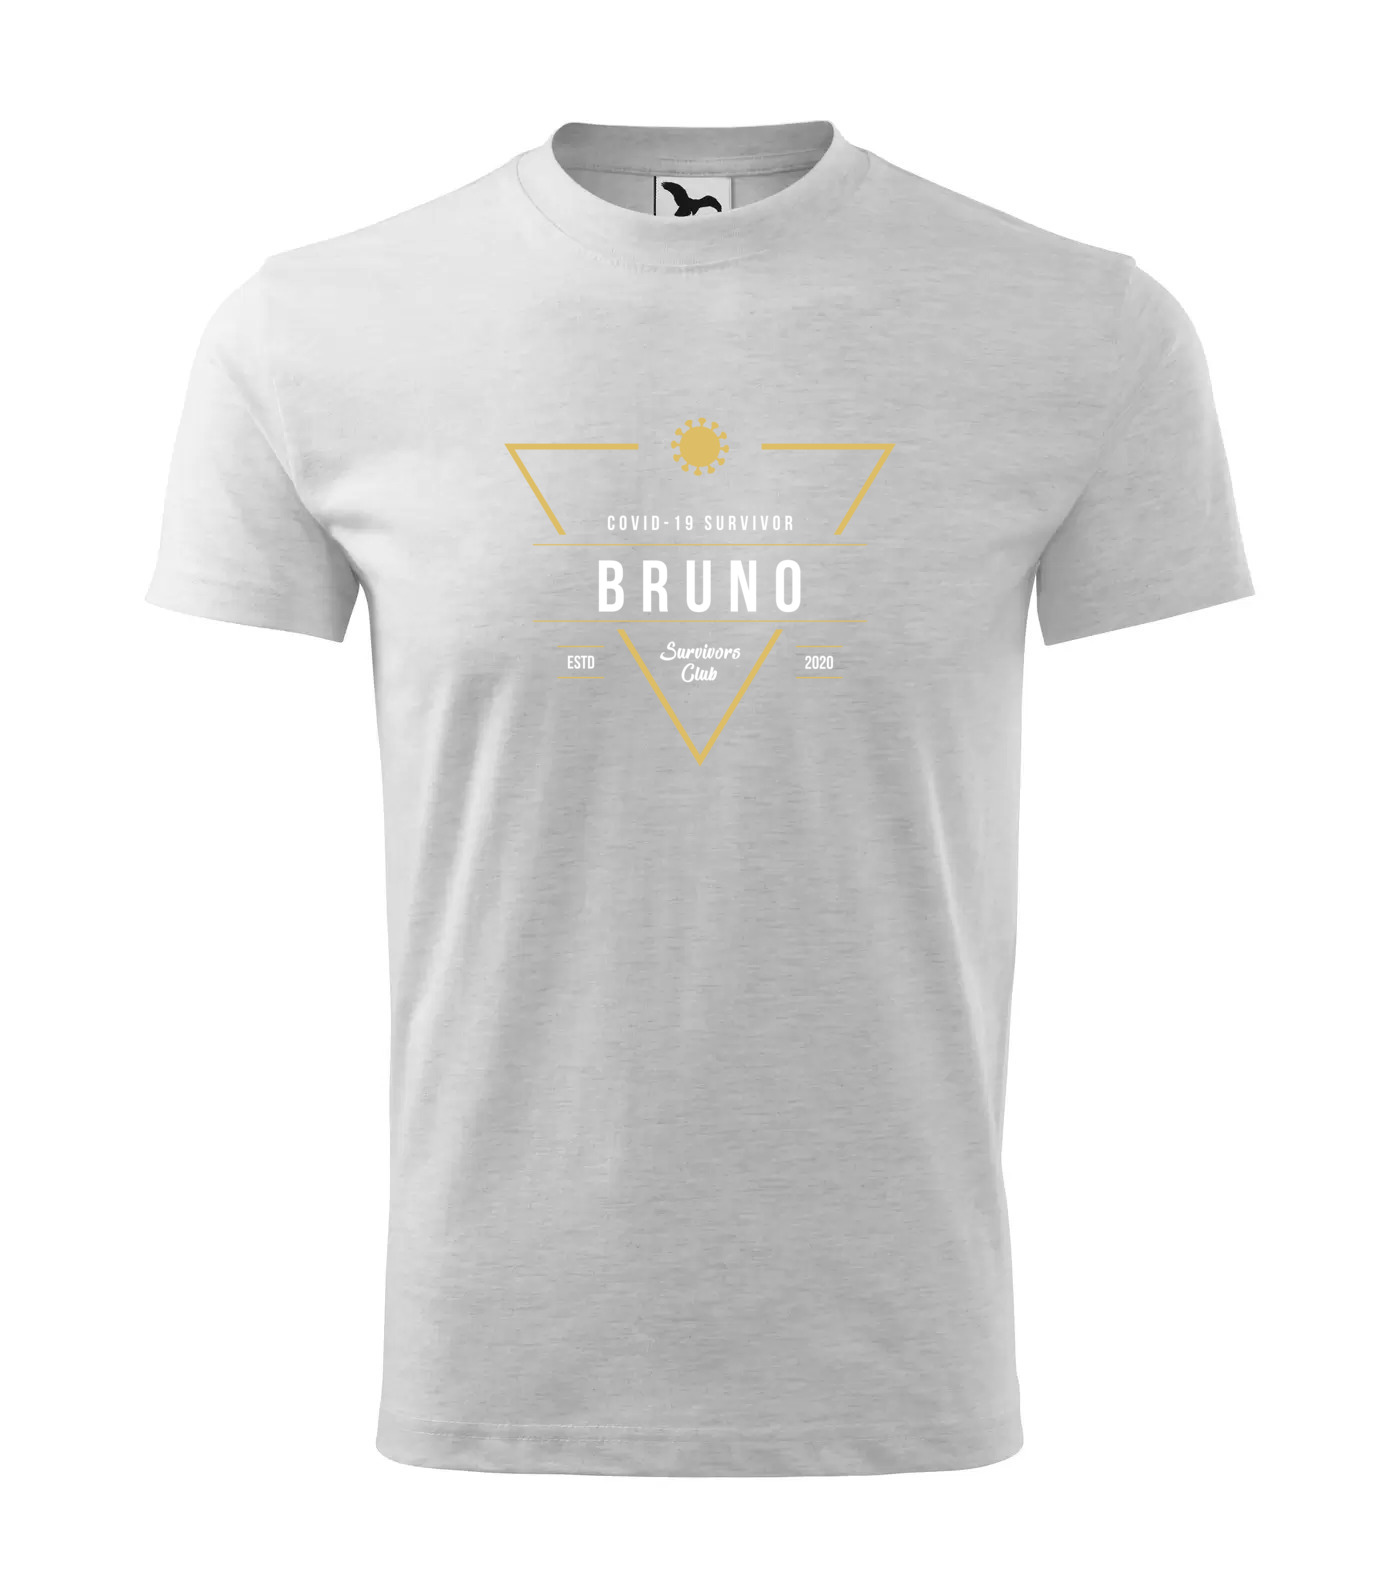 Tričko Survivor Club Bruno